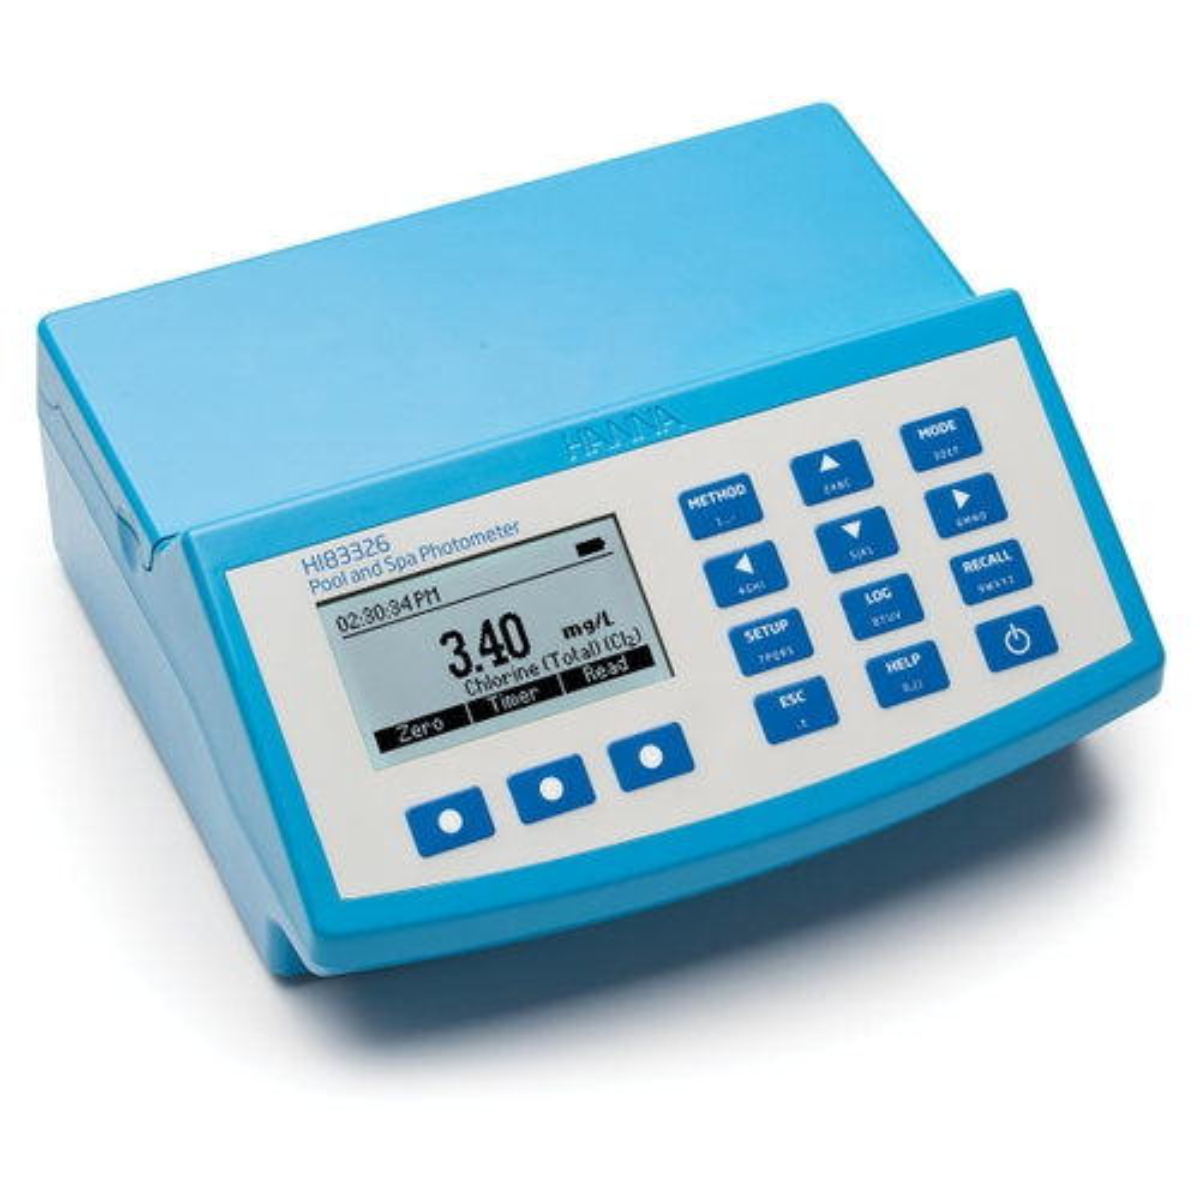 HI83326 Pool and Spa Photometer